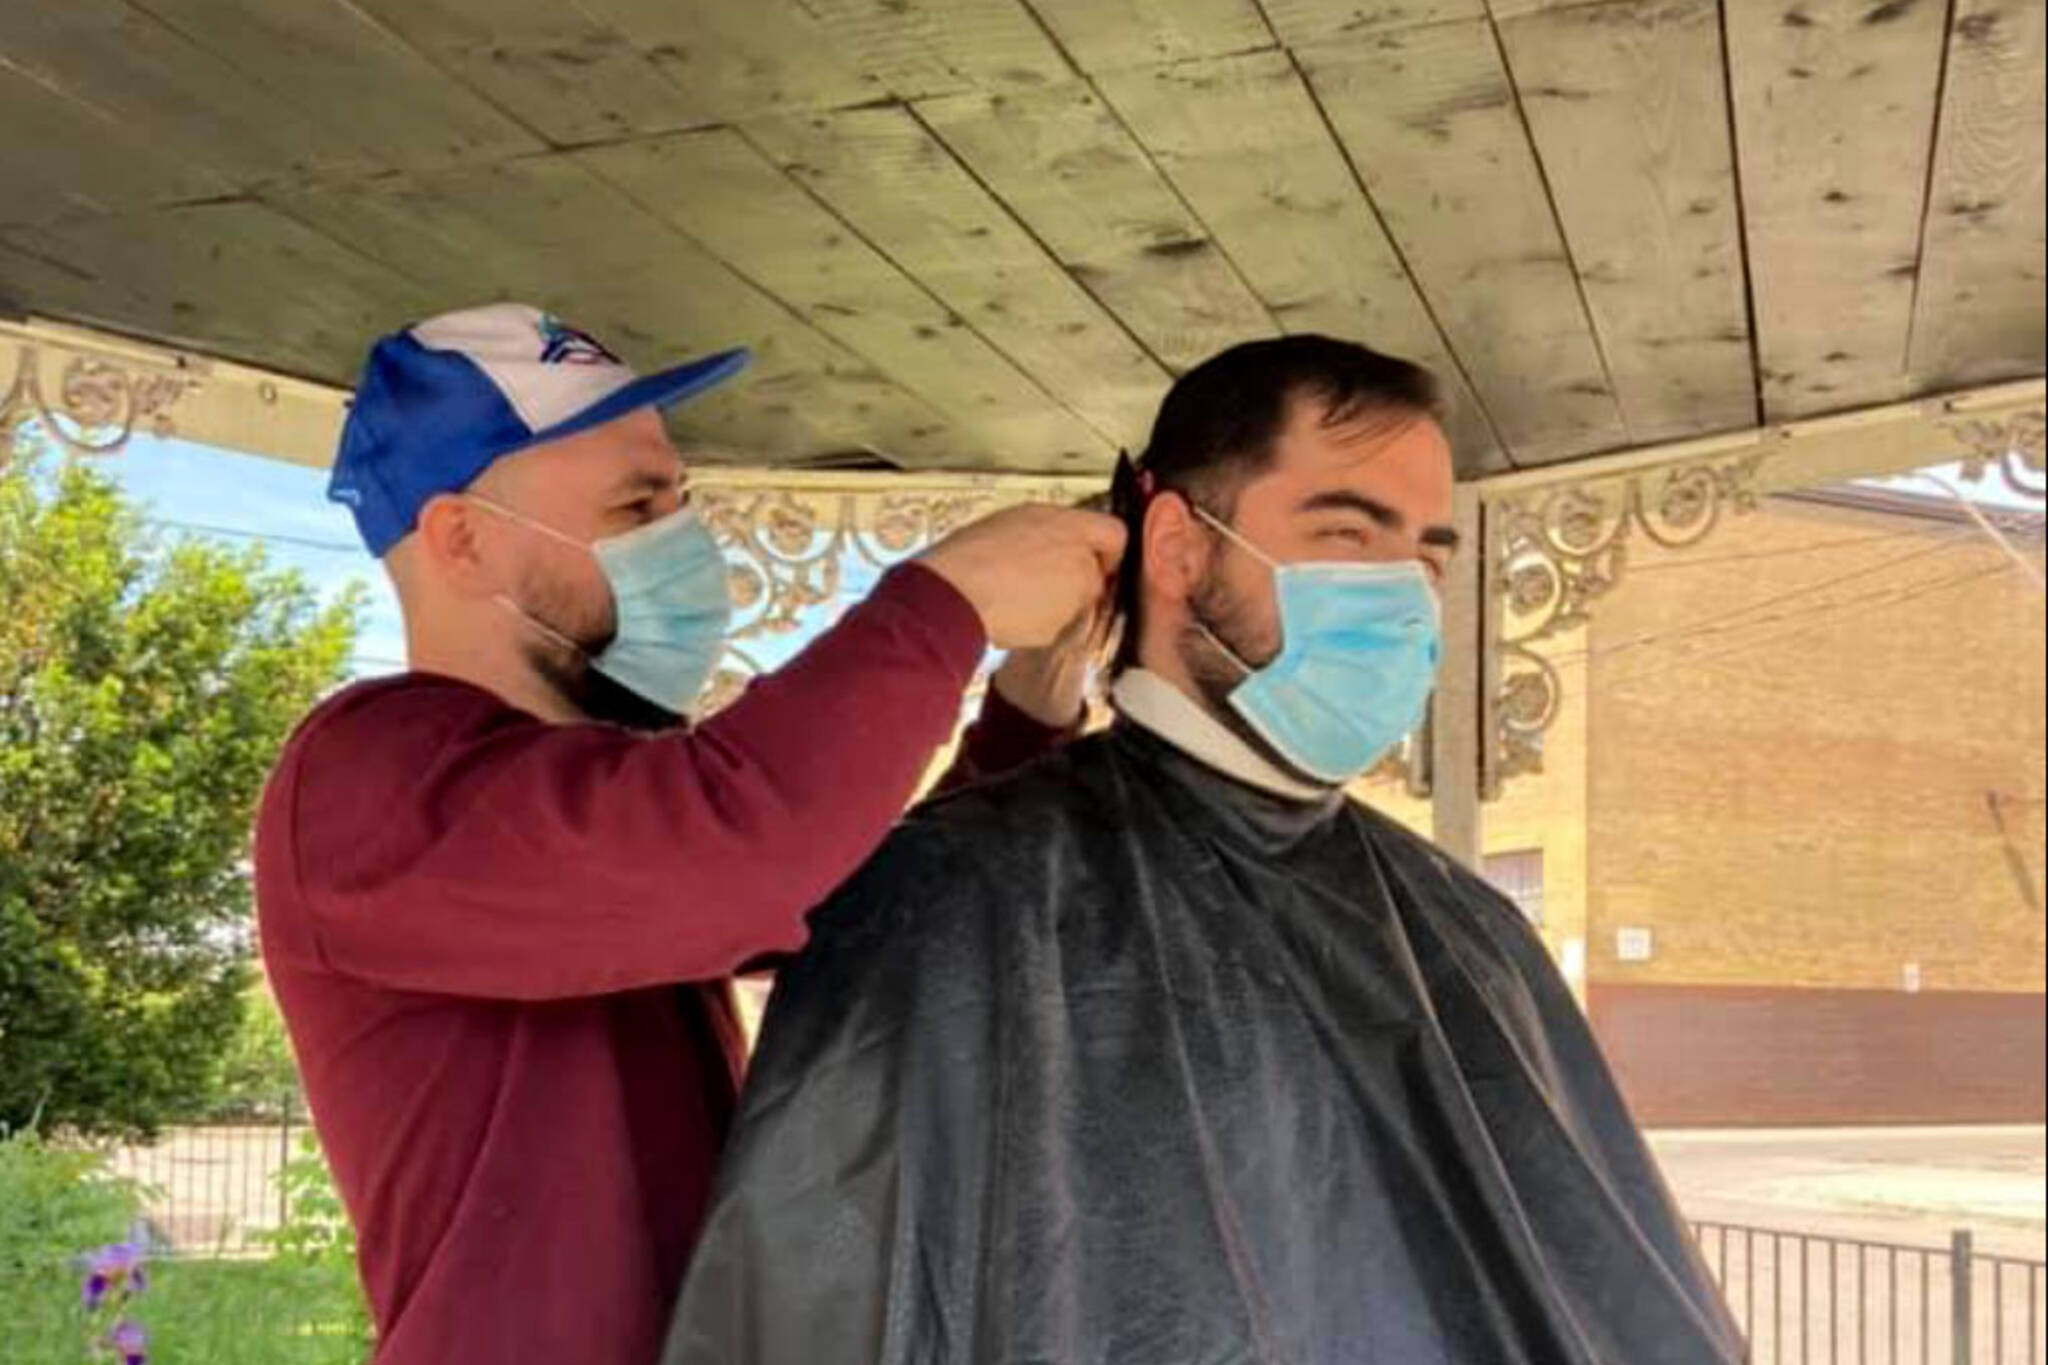 outdoor haircuts toronto